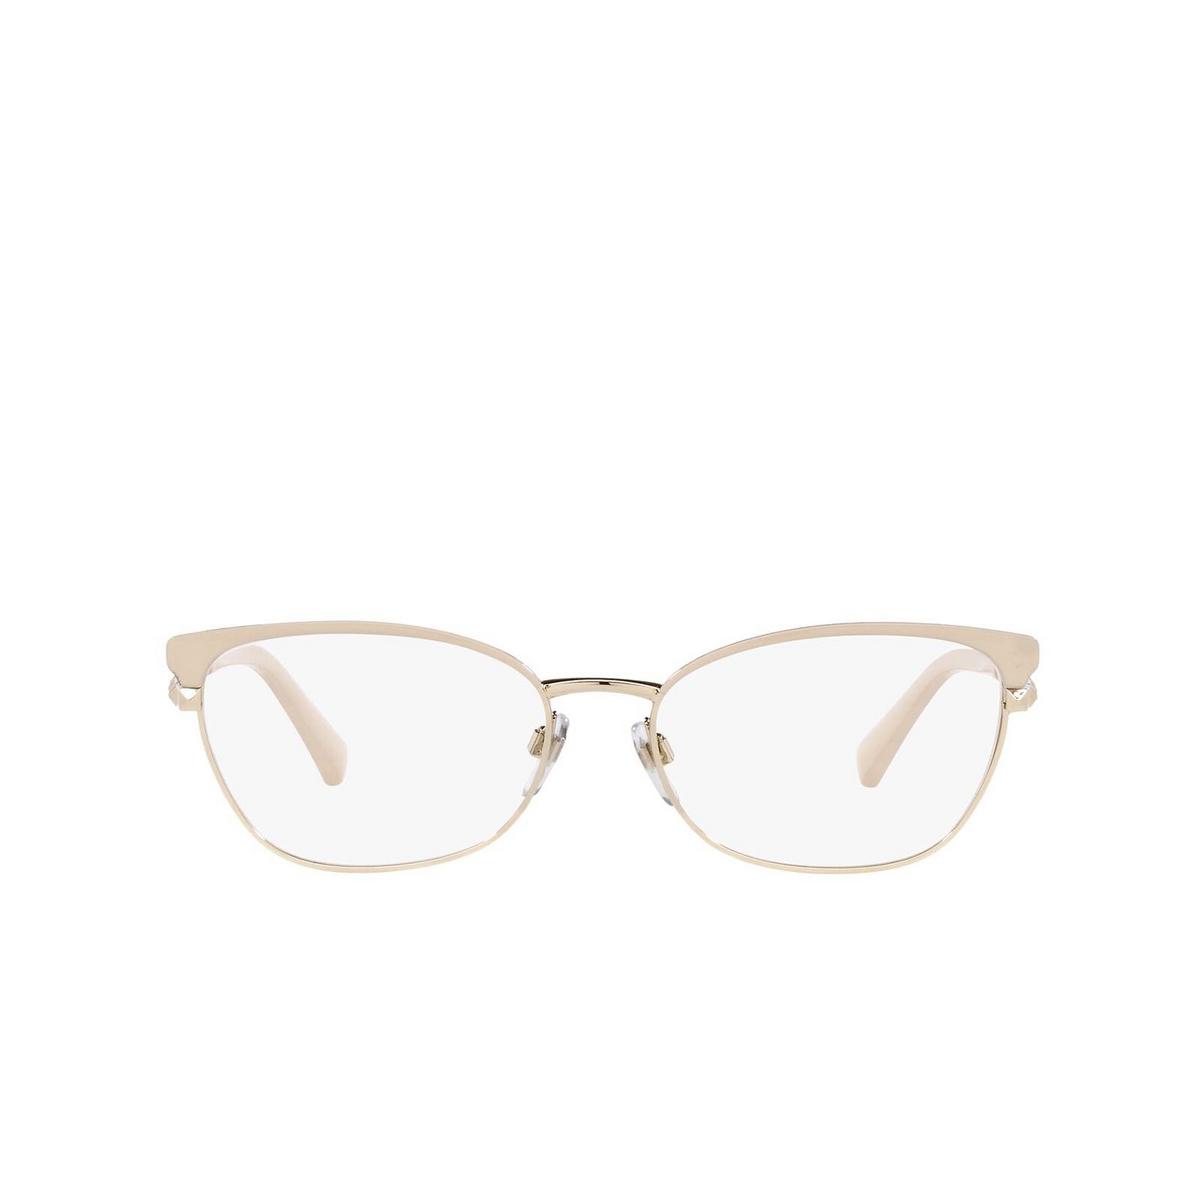 Valentino® Cat-eye Sunglasses: VA1022 color Pale Gold/black 3053.